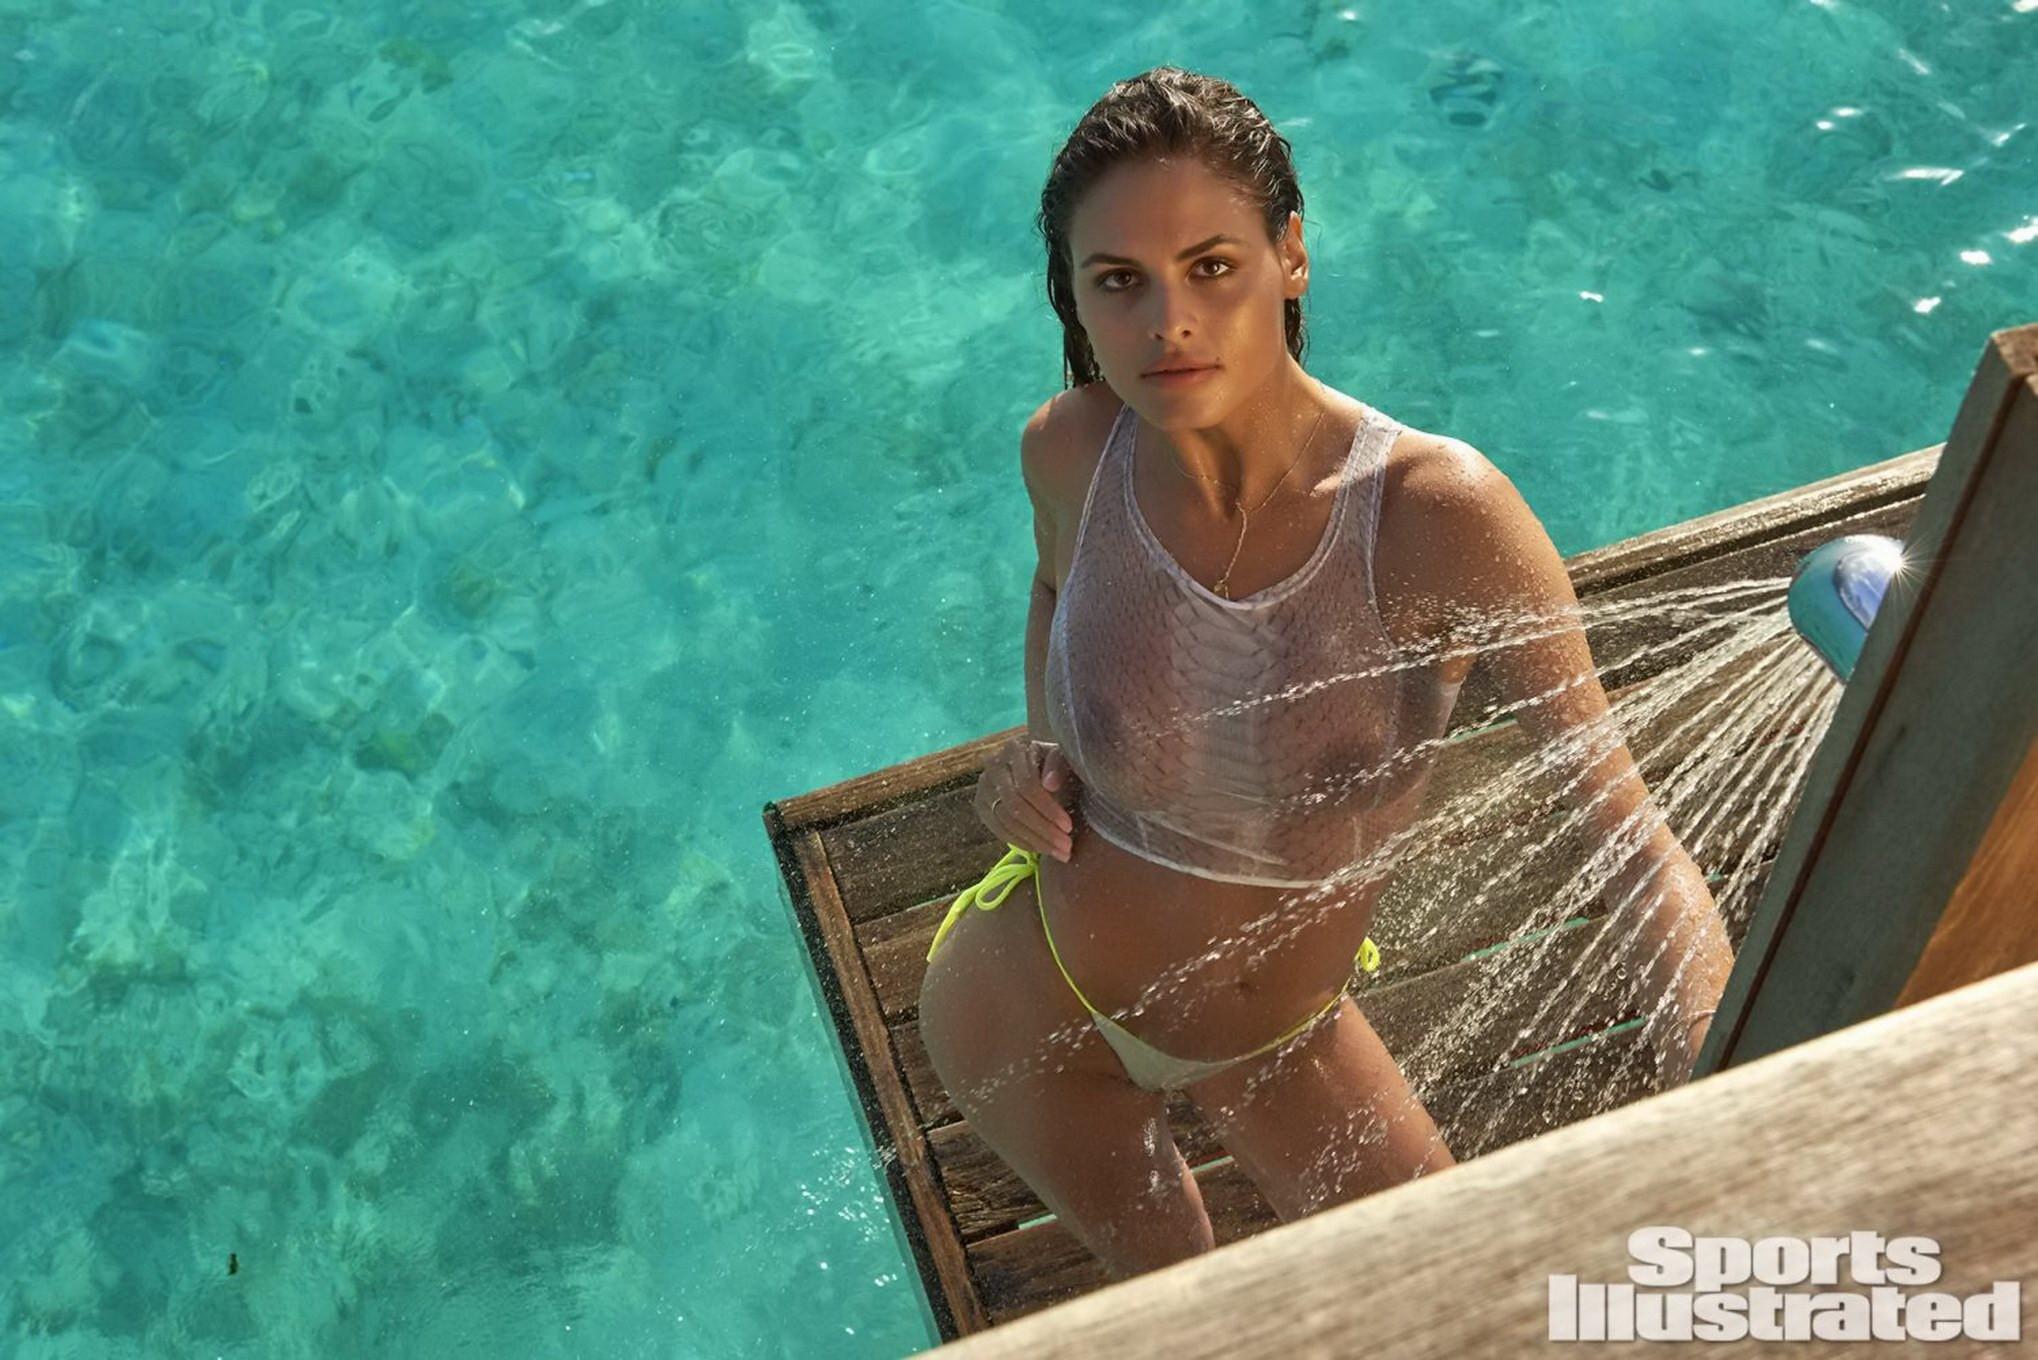 nudes (71 photo), Paparazzi Celebrites images